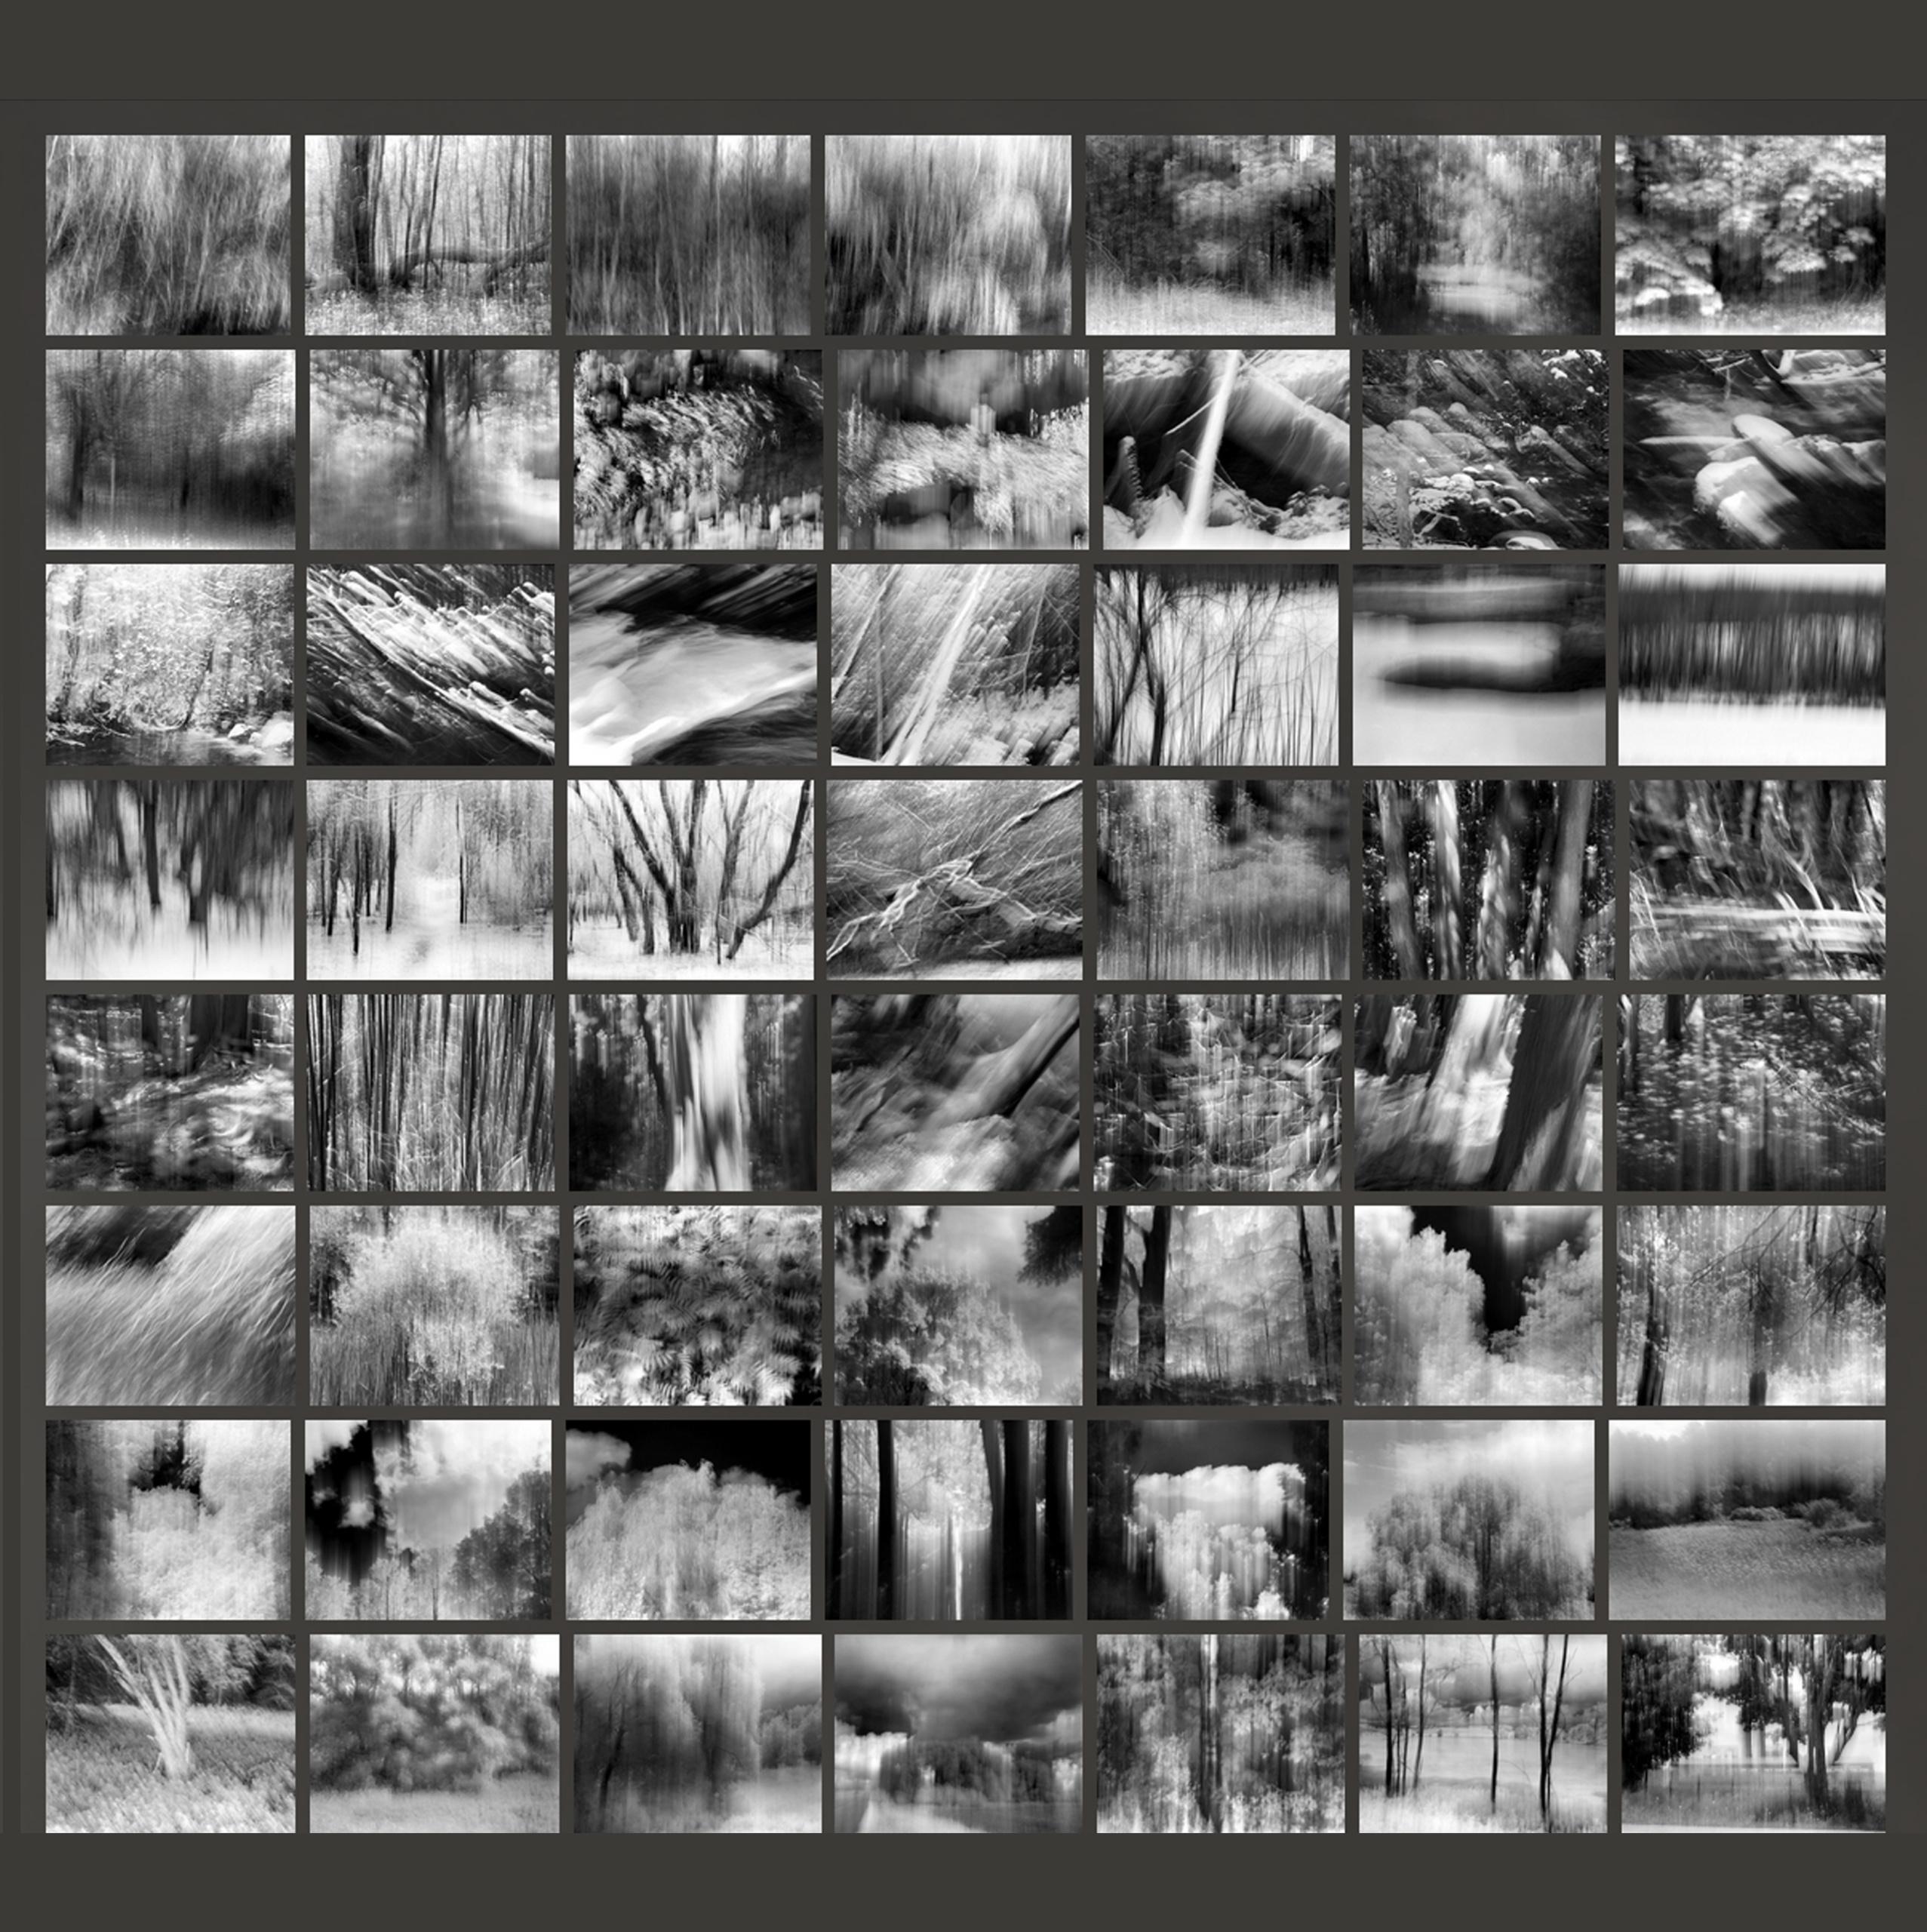 Simeon Posen, Quilted Landscape 300dpi (1), 2020